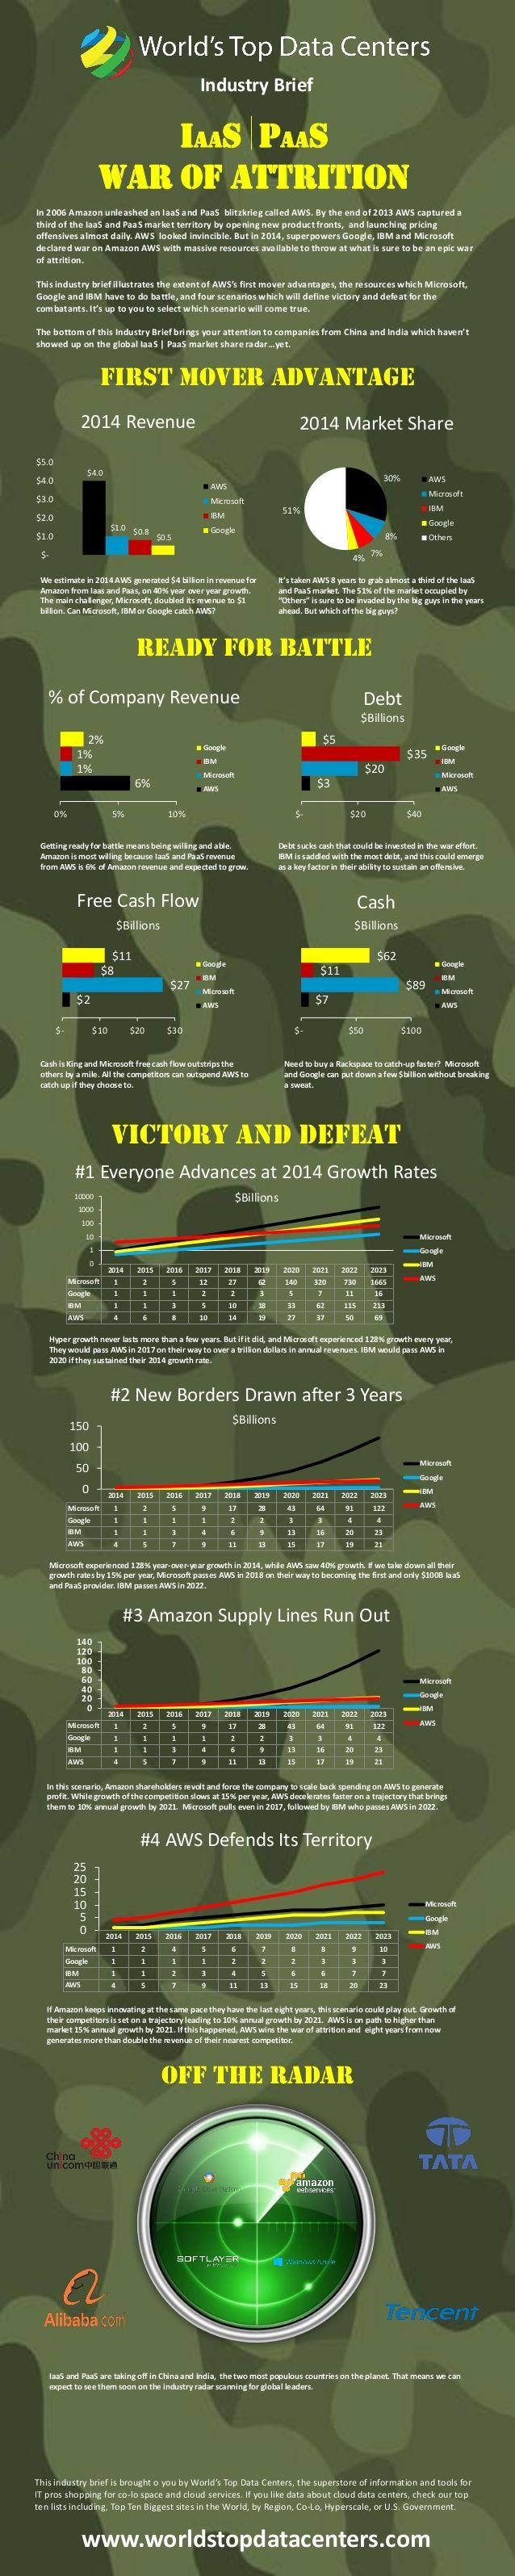 War of Attrition: AWS vs. Google. IBM and Microsoft Azure